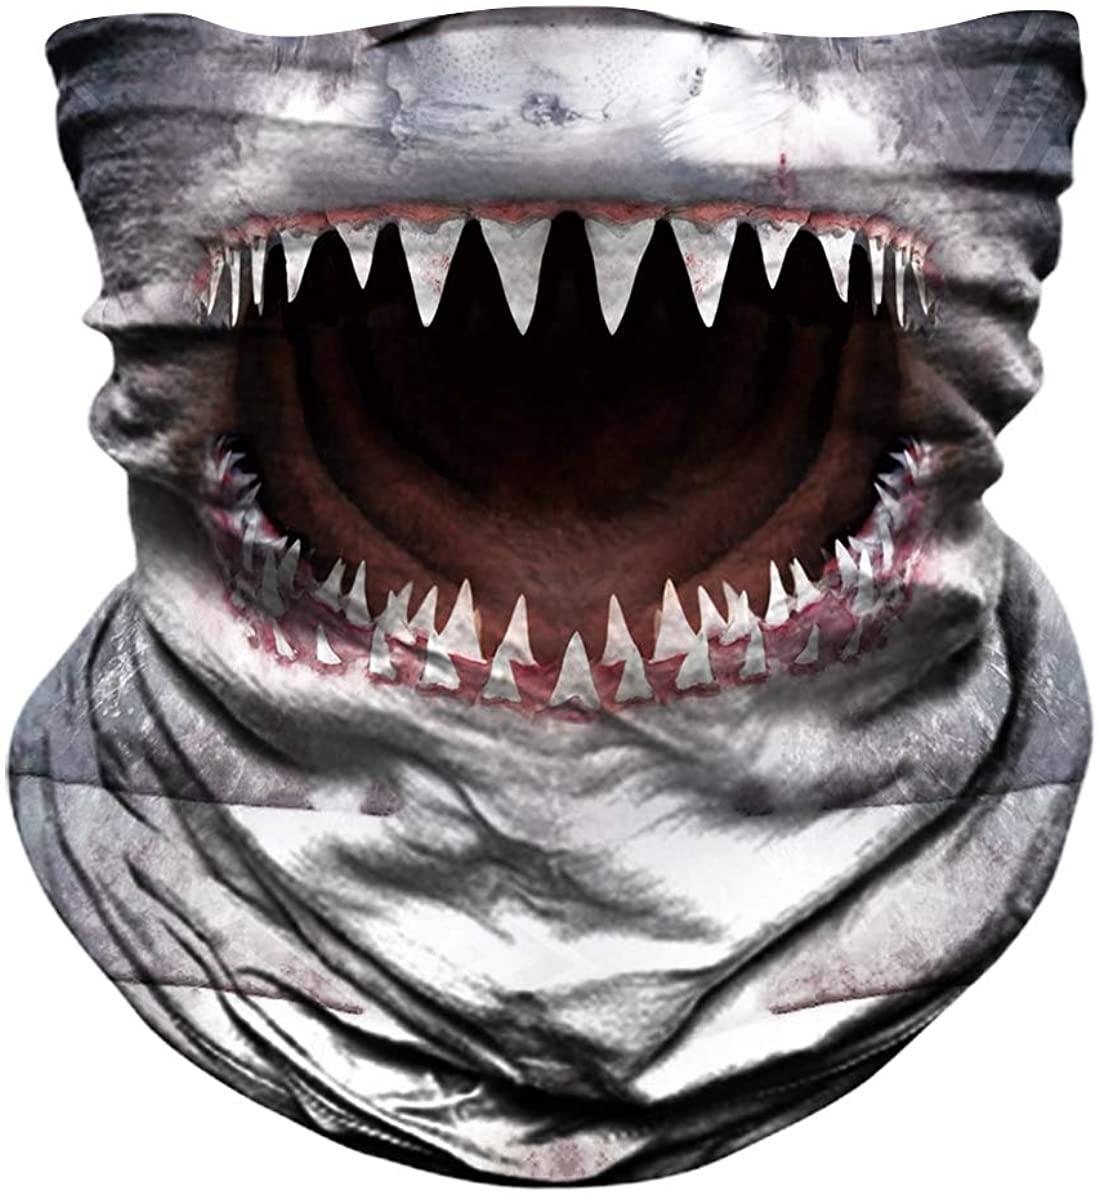 JOEYOUNG Seamless Face Mask for Men Women - Animal Hunting Half Face Mask, Fishing Scarf, 3D Neck Gaiter UV Sun Mask, Bandanas Balaclava for Motorcycle Riding Skiing, Dust Tube Mask Halloween Headwear